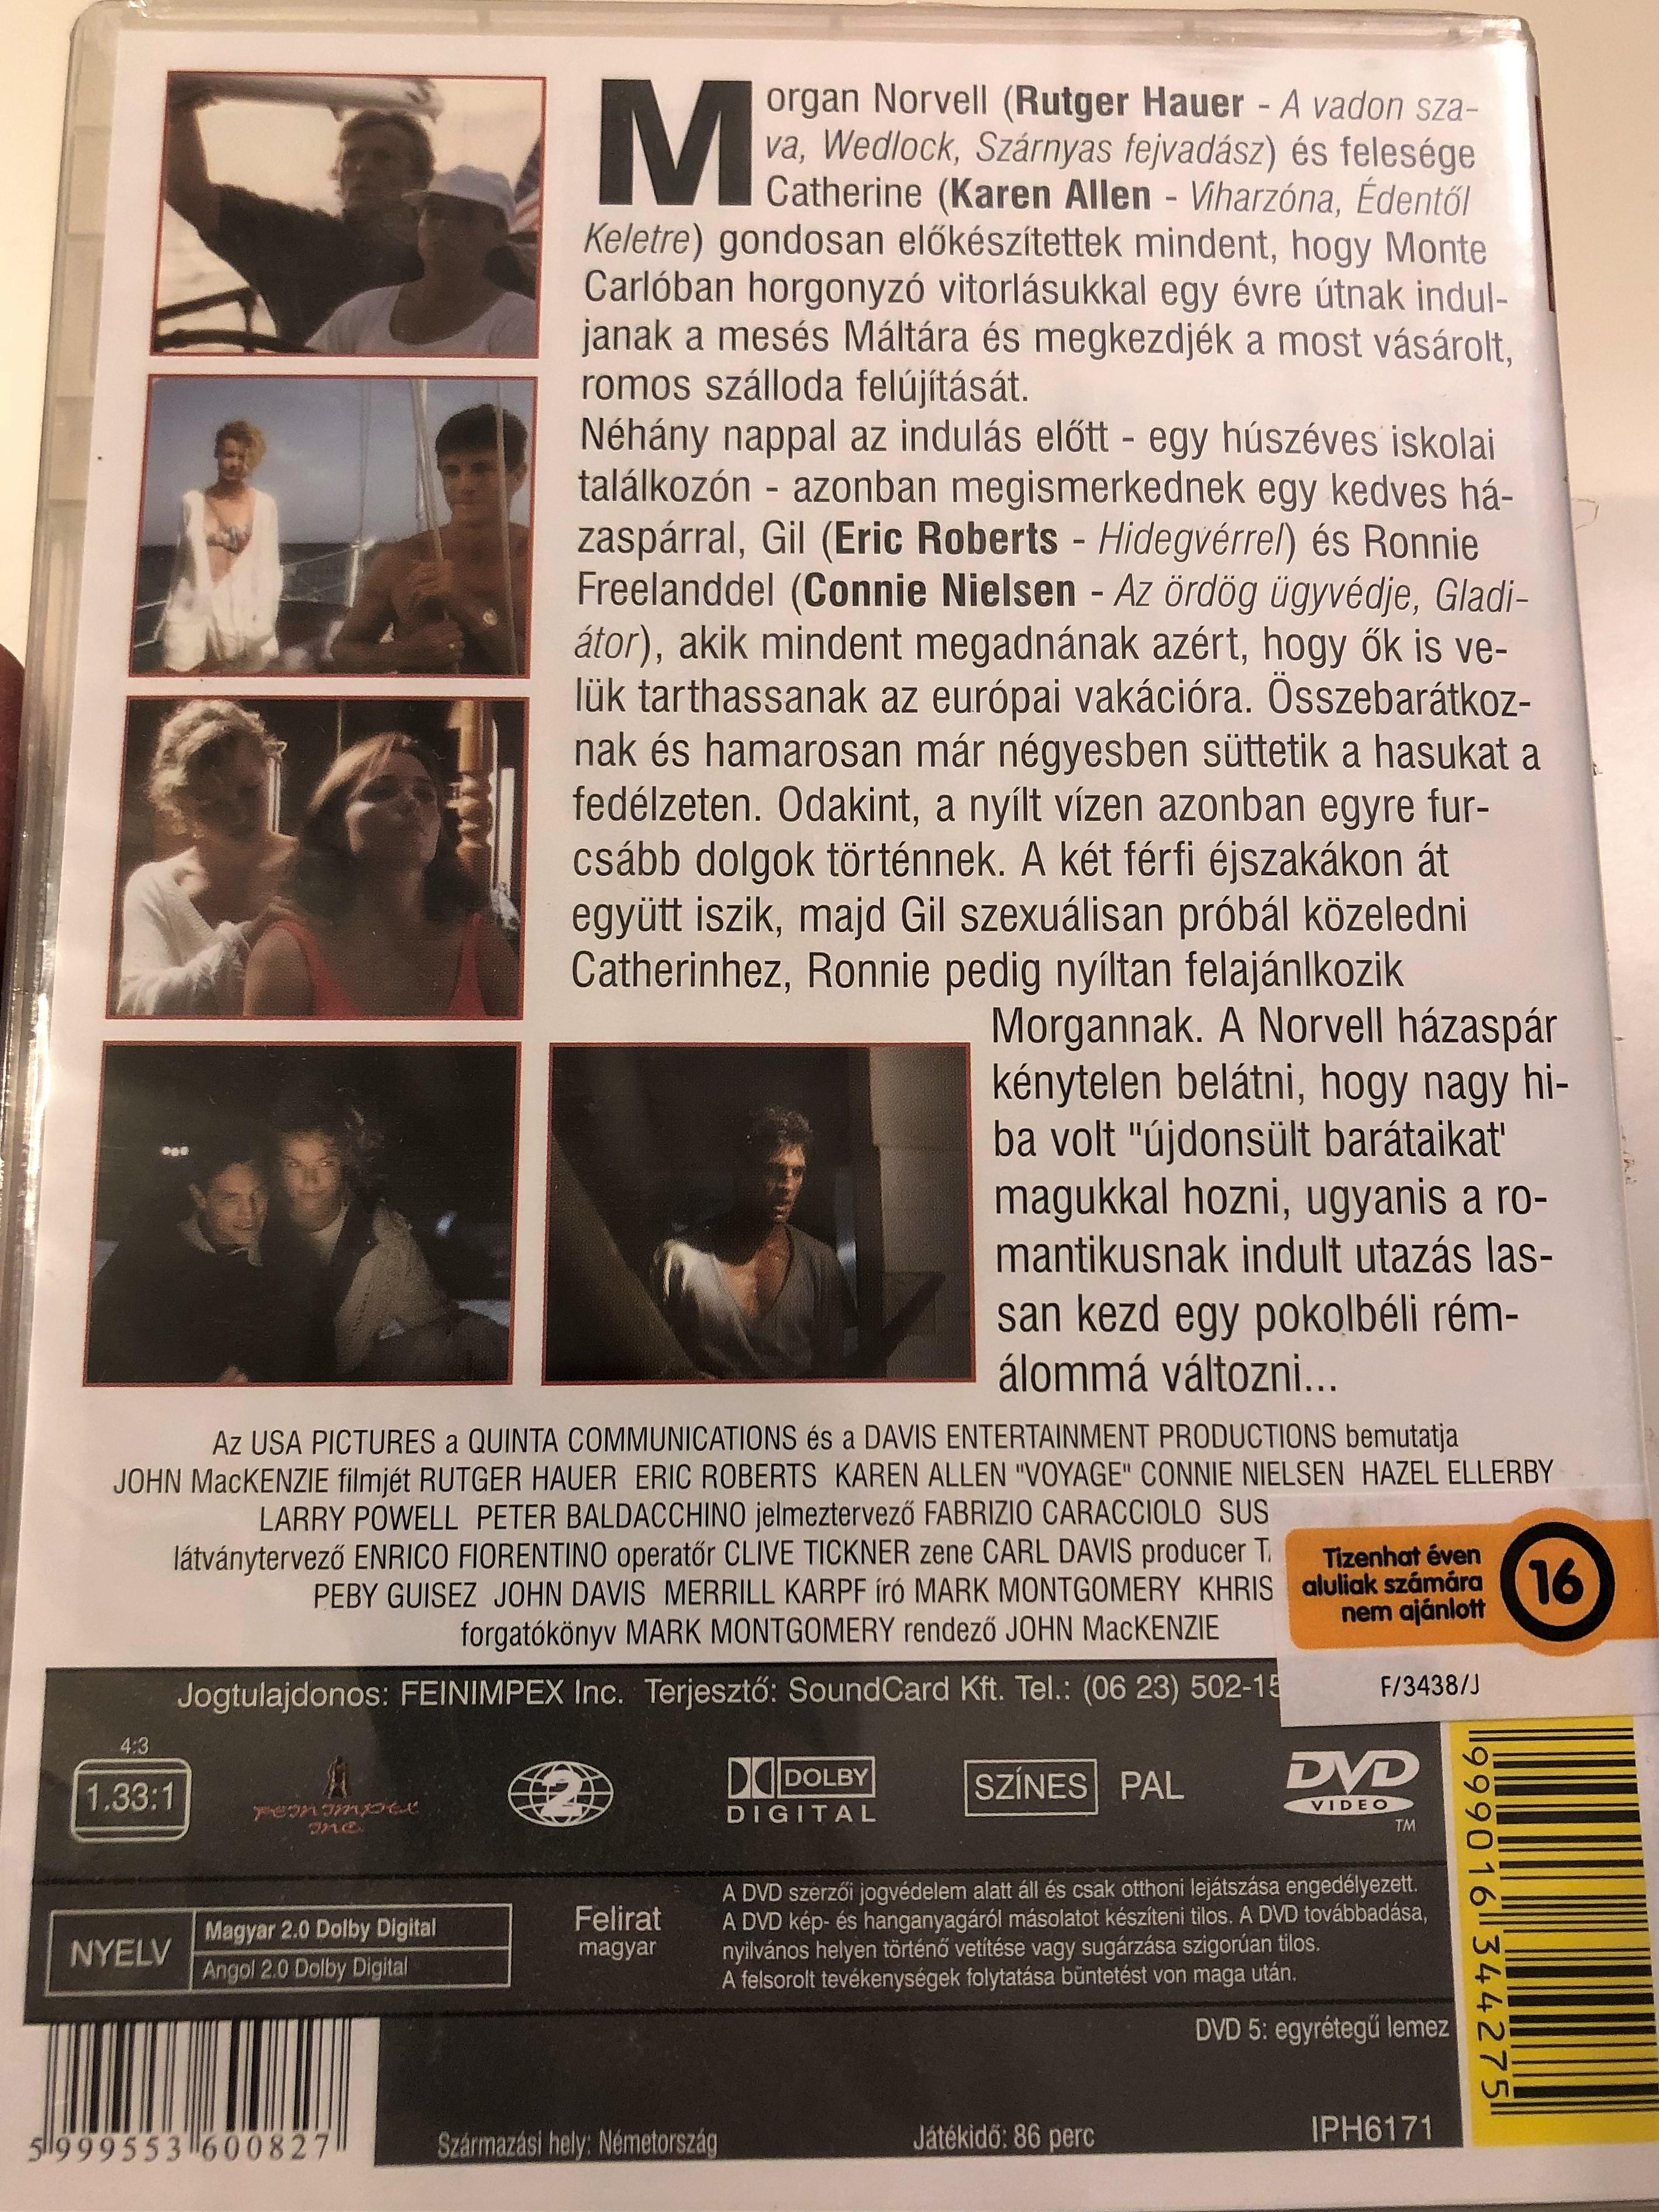 voyage-dvd-1993-pokoli-utaz-s-directed-by-john-mackenzie-starring-rutger-hauer-eric-roberts-karen-allen-2-.jpg